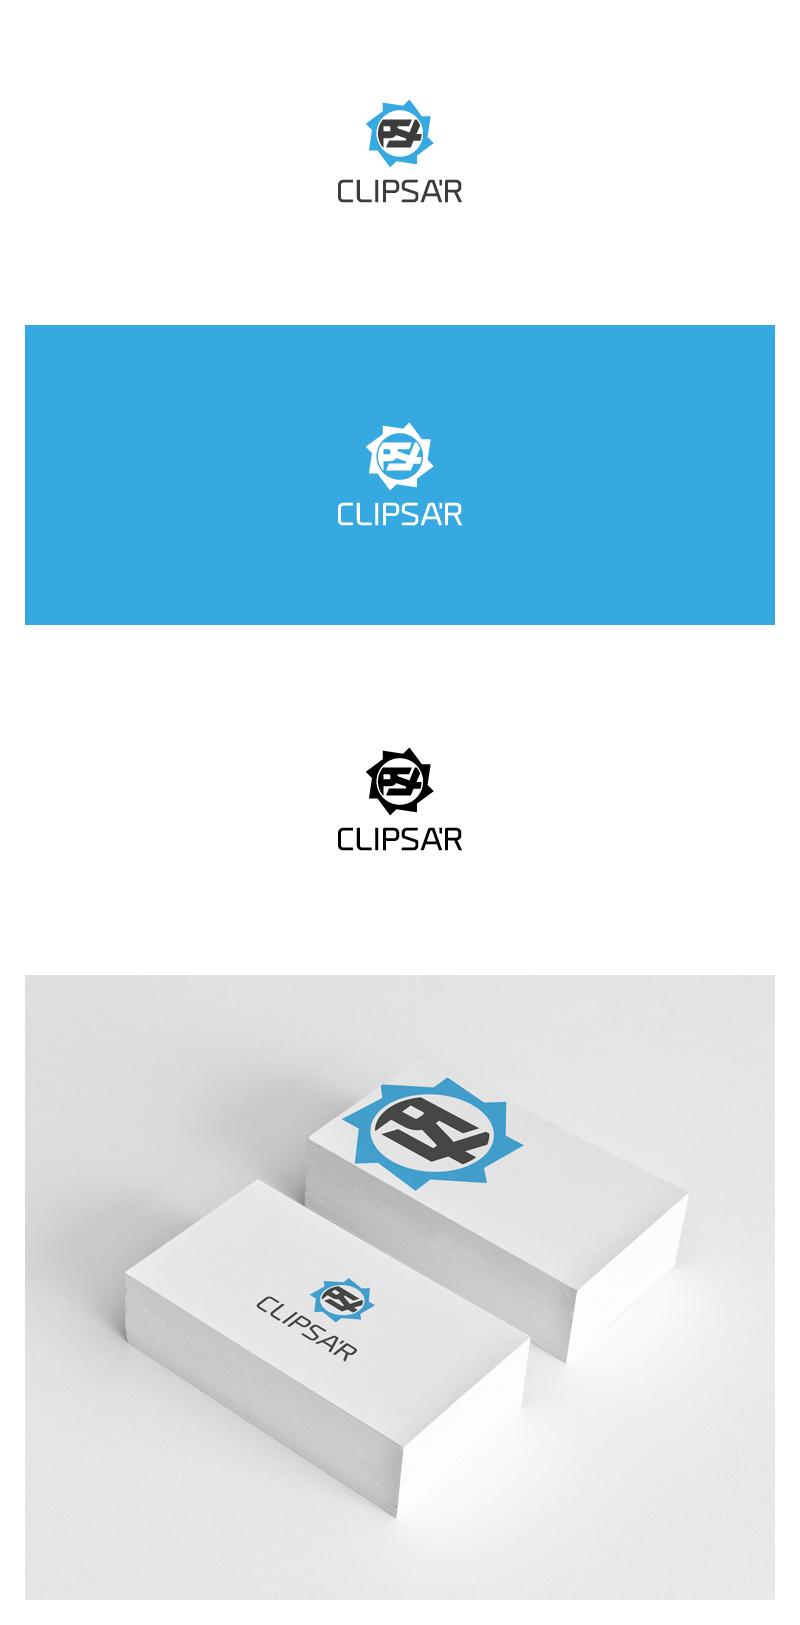 Знак, логотип, CLIPSAR, ПромСтройАвтоматика